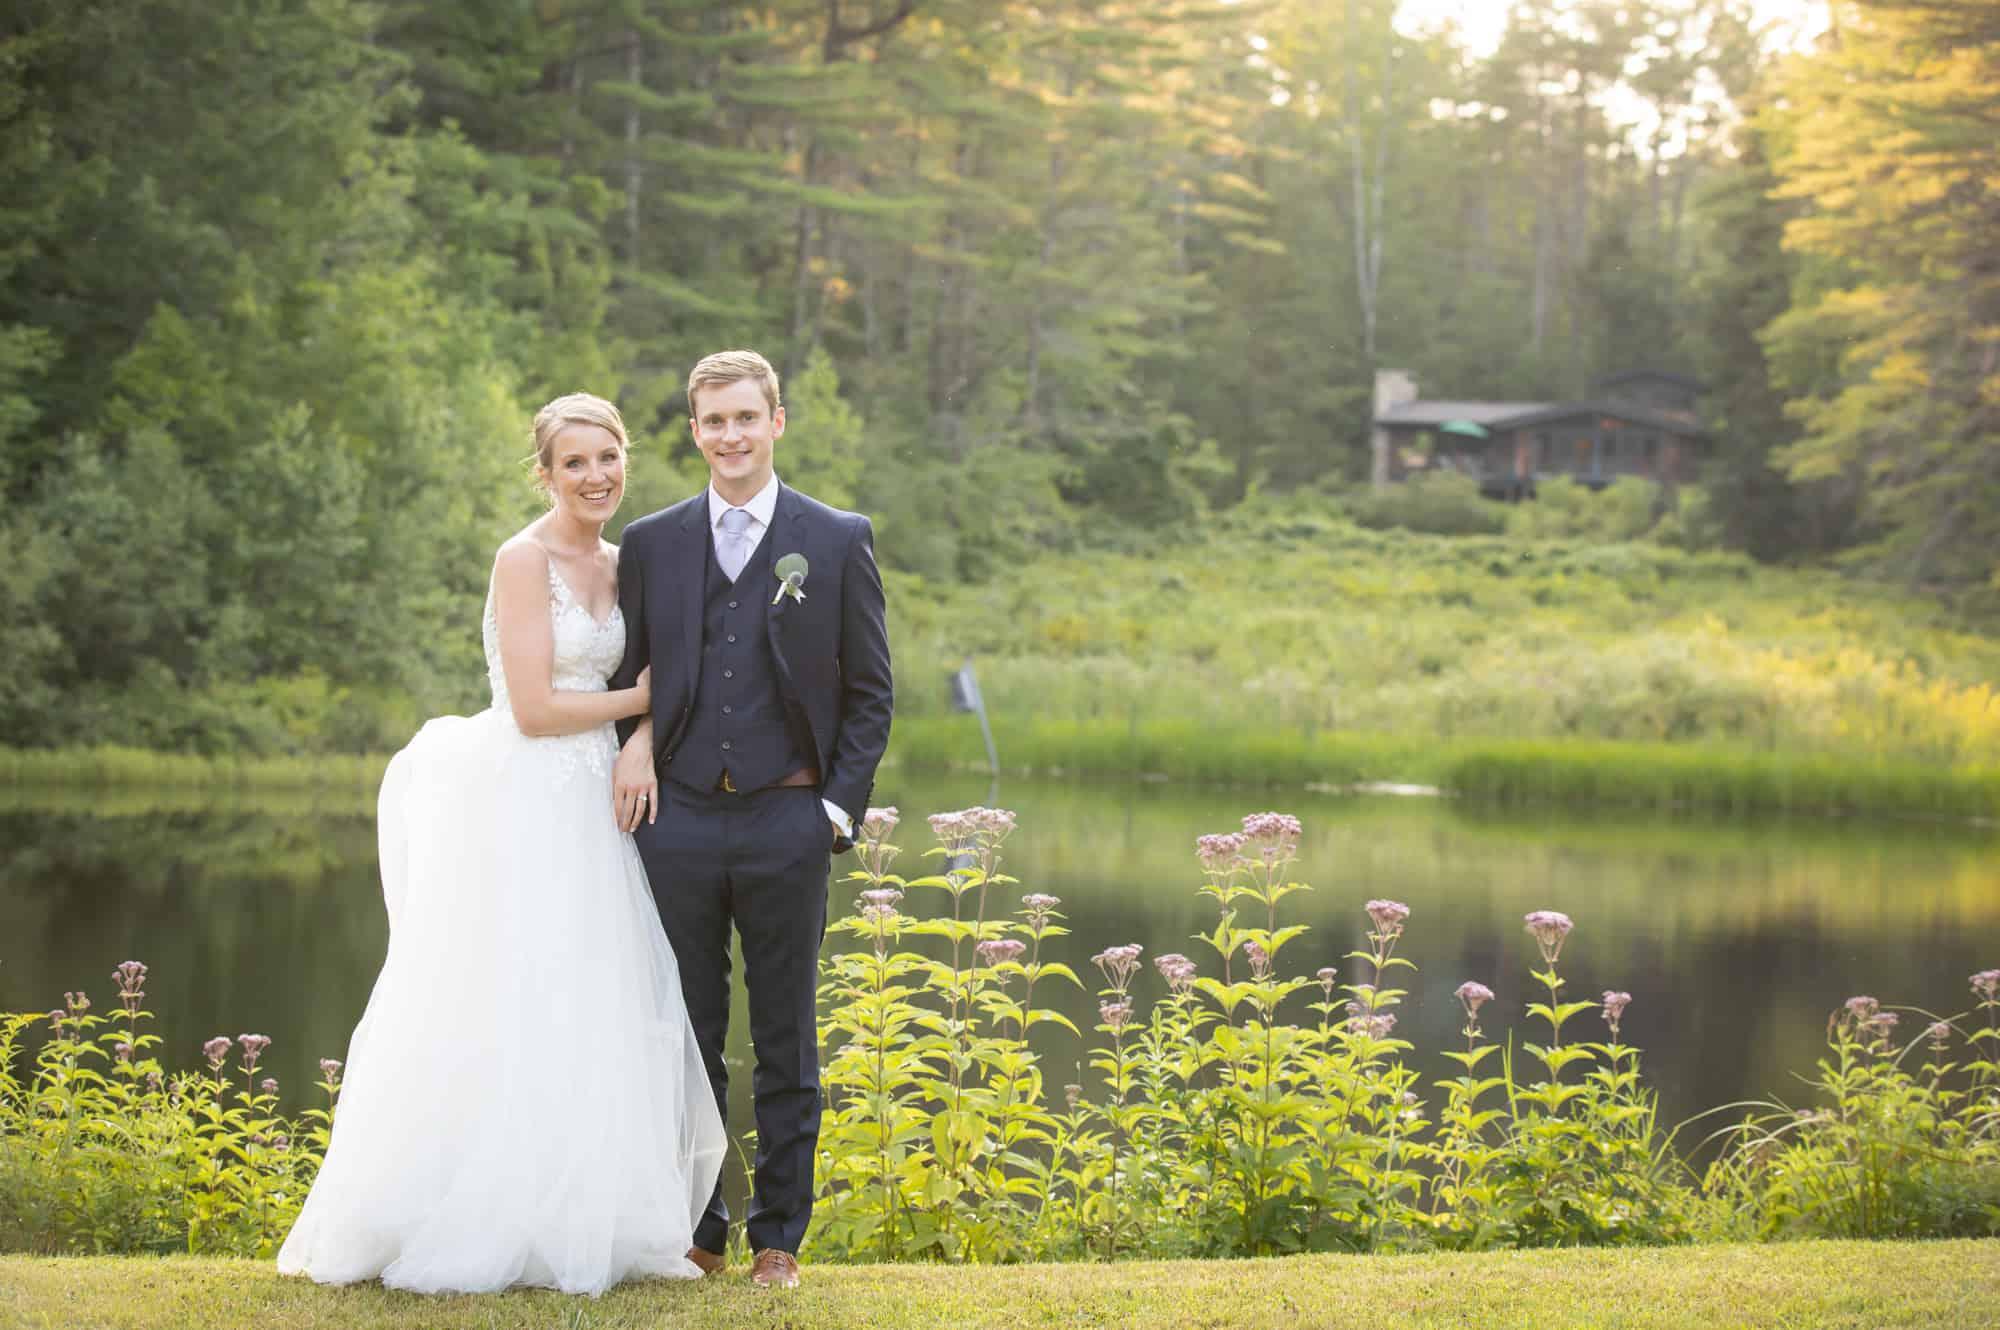 Trevor Amp Taylor S New London Nh Wedding Lakes Region